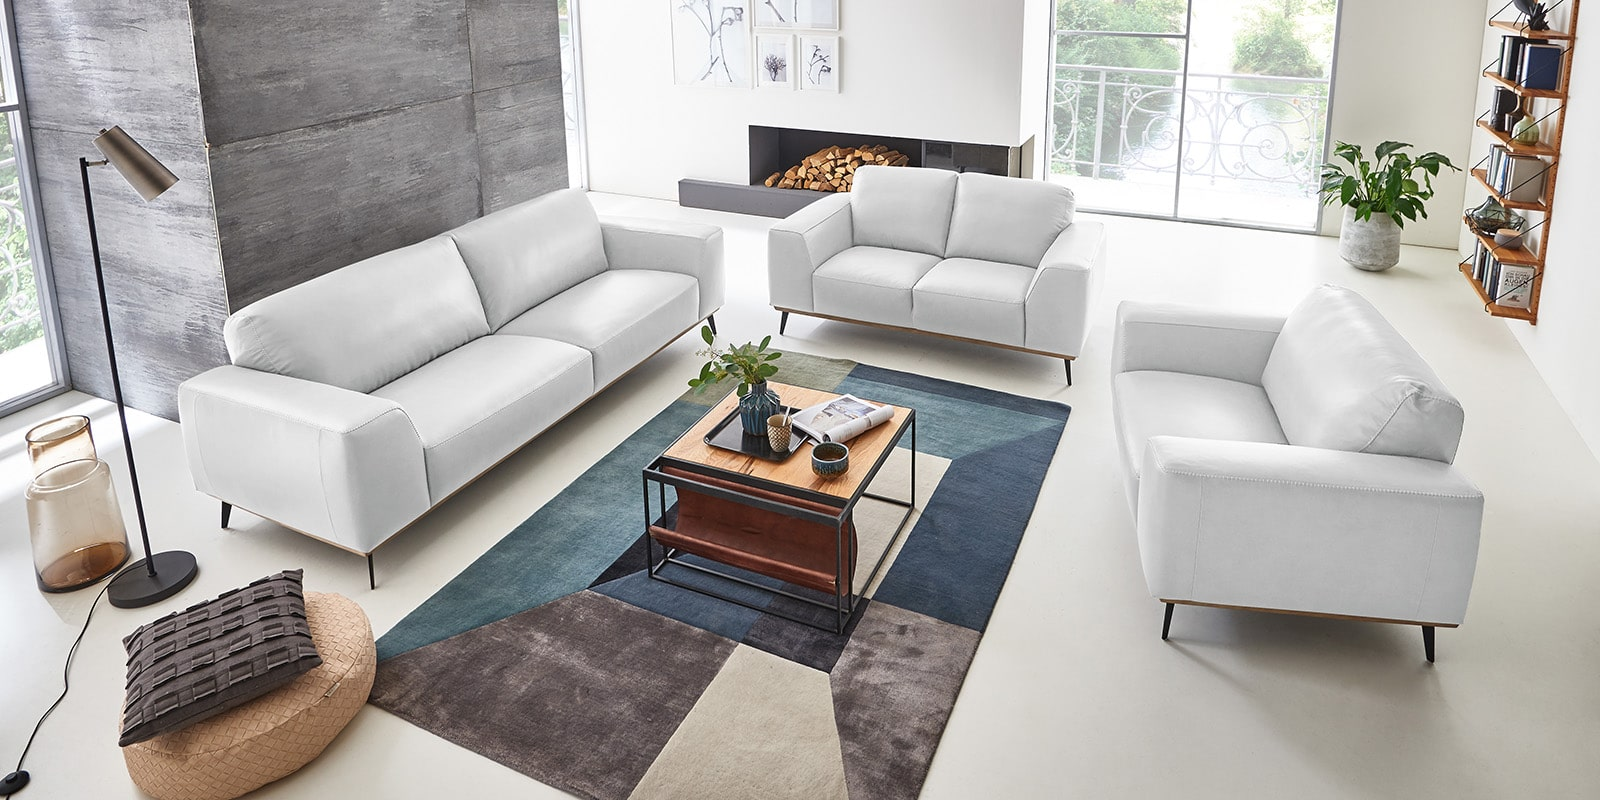 Moebella24 - 3-2-1-Sitzer - Sofa - Barcelona - Leder - Weiß - Skandinavisches - Design - Punto - cavallo - Nähte